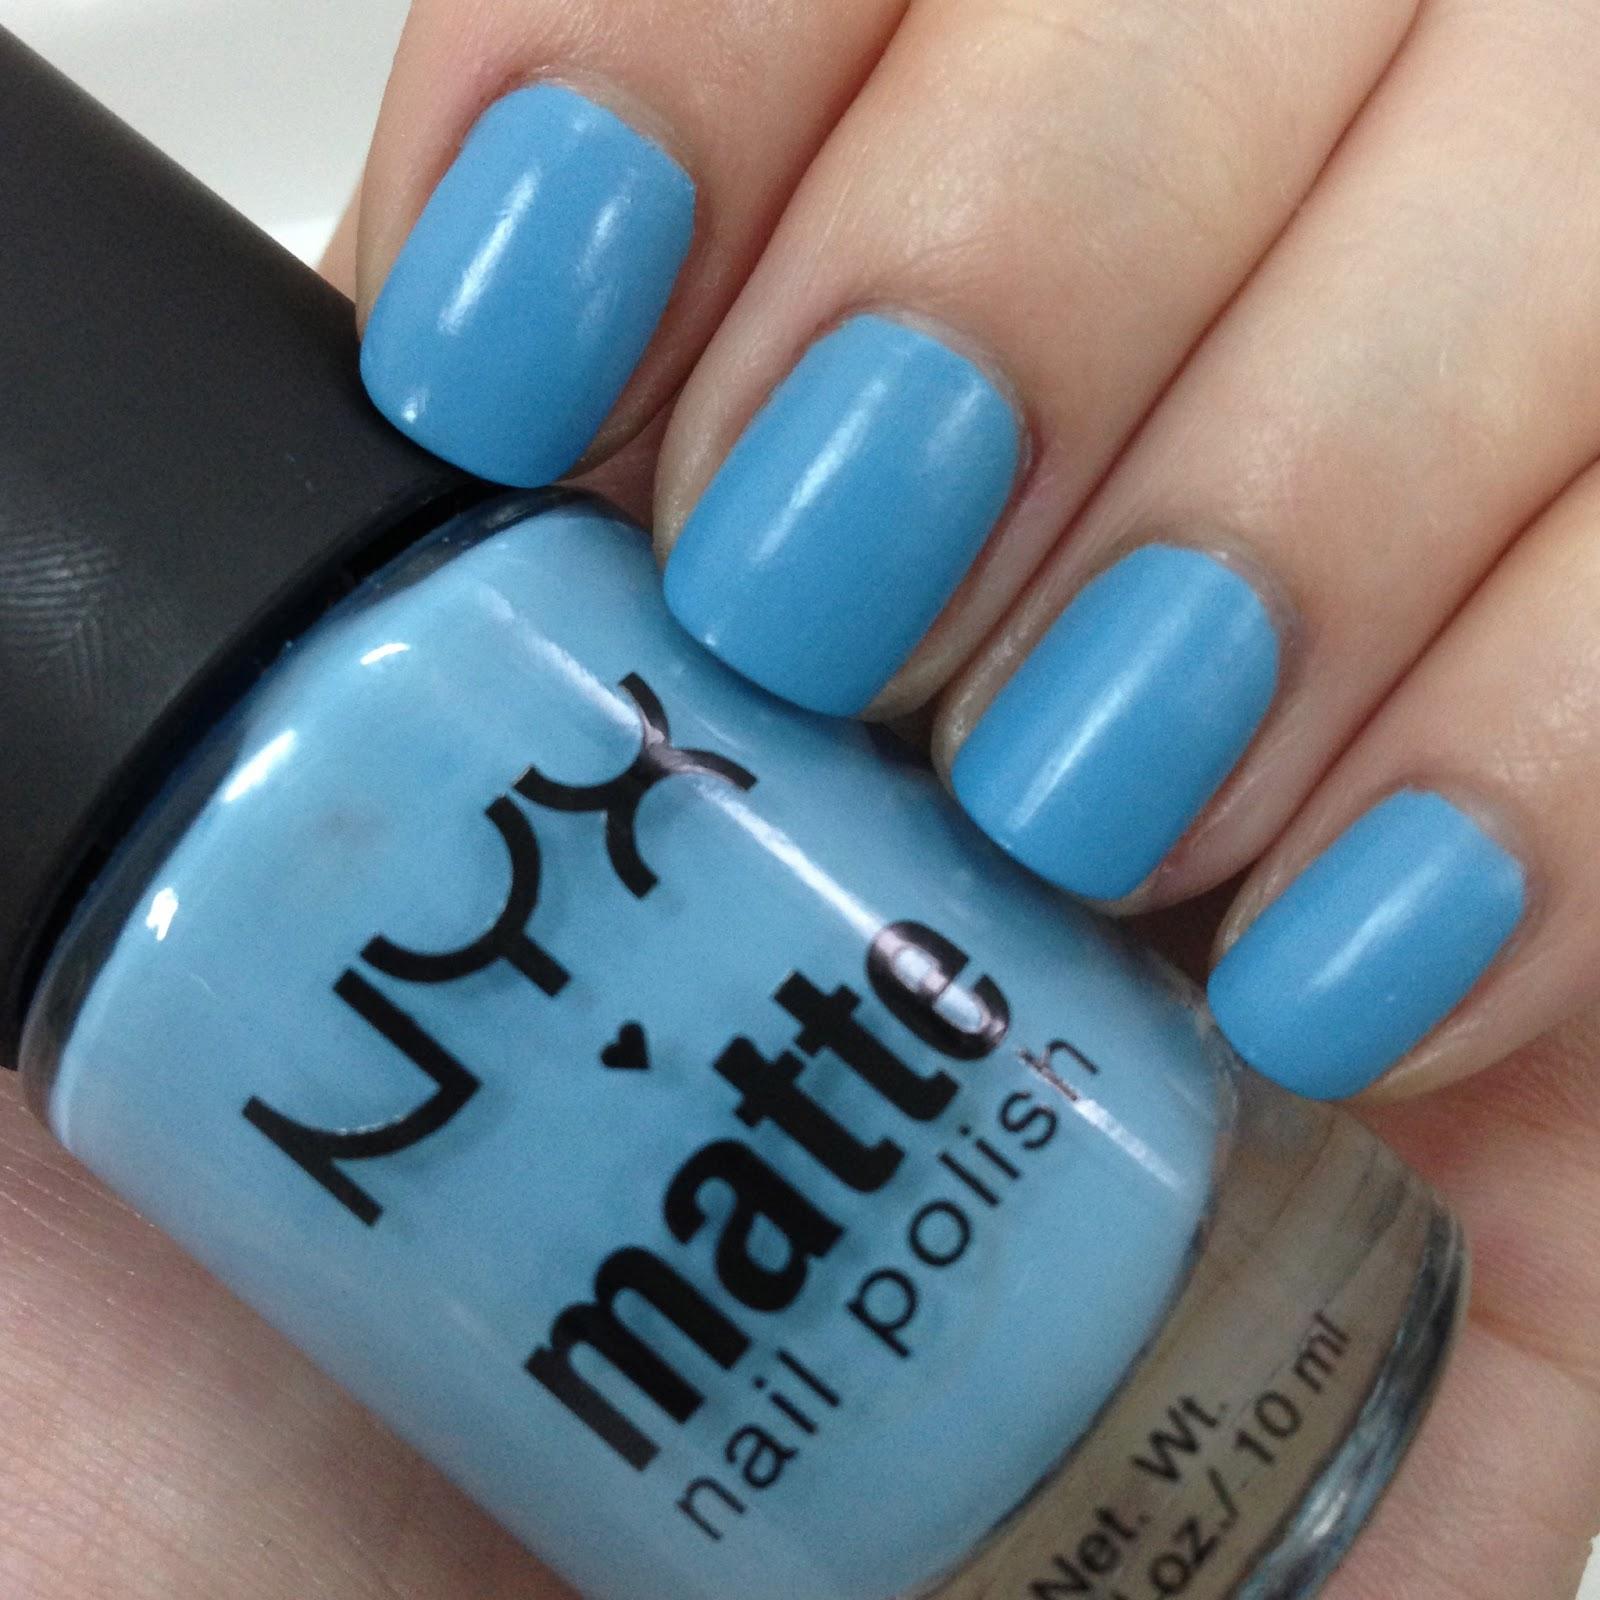 Karen Lives High: NYX Matte Nail Polish in Sky Blue